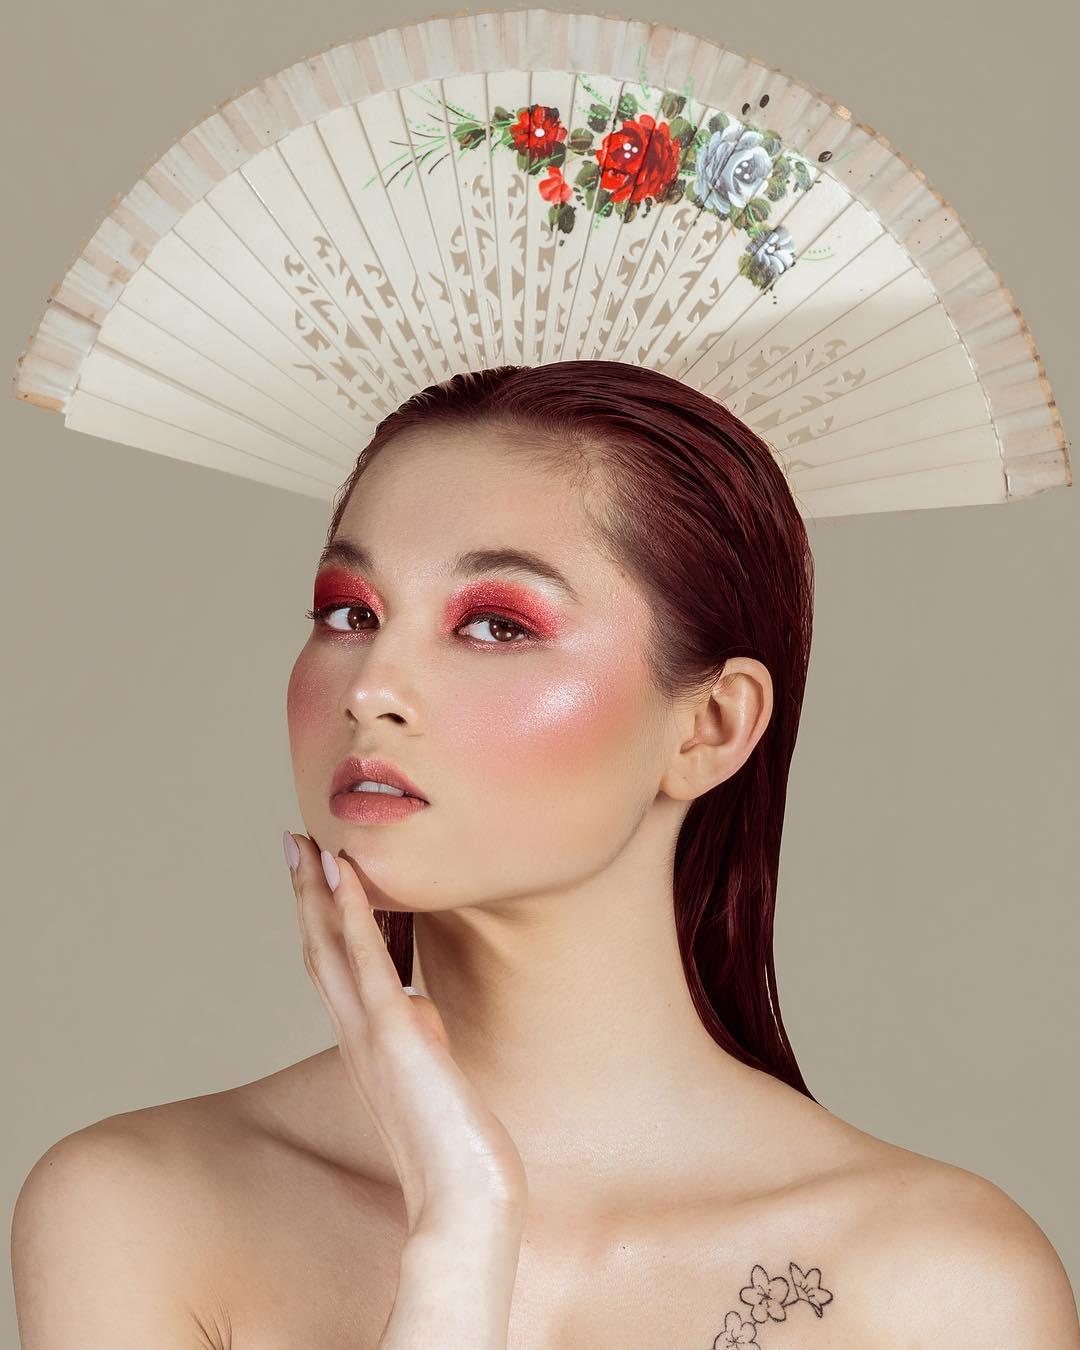 Яркая мода, красота и гламур на снимках Инес Буш